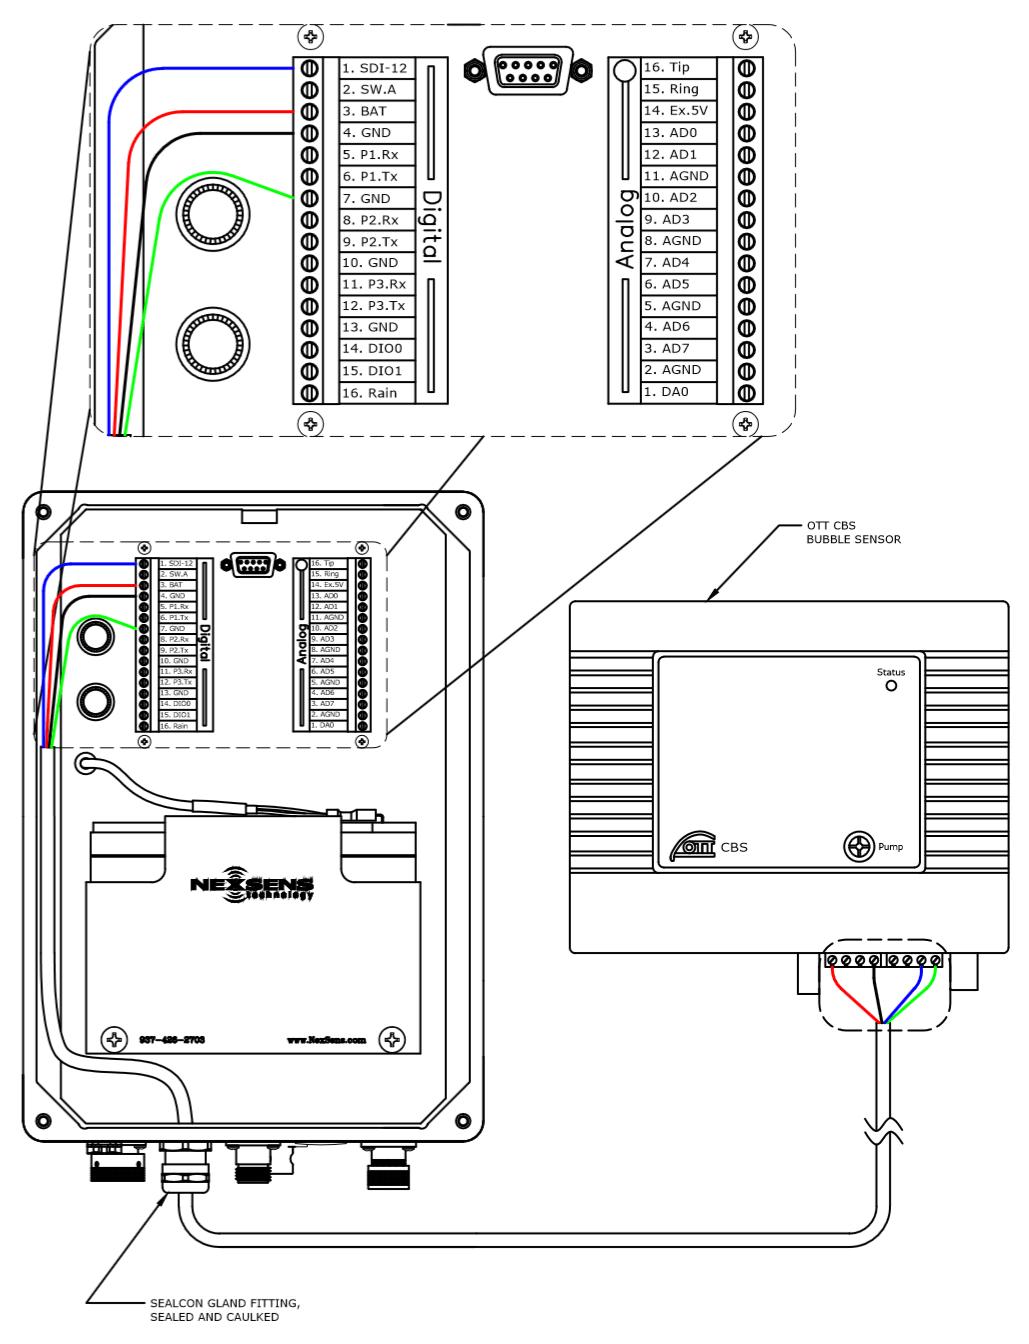 Ott Cbs Compact Bubbler Sensor